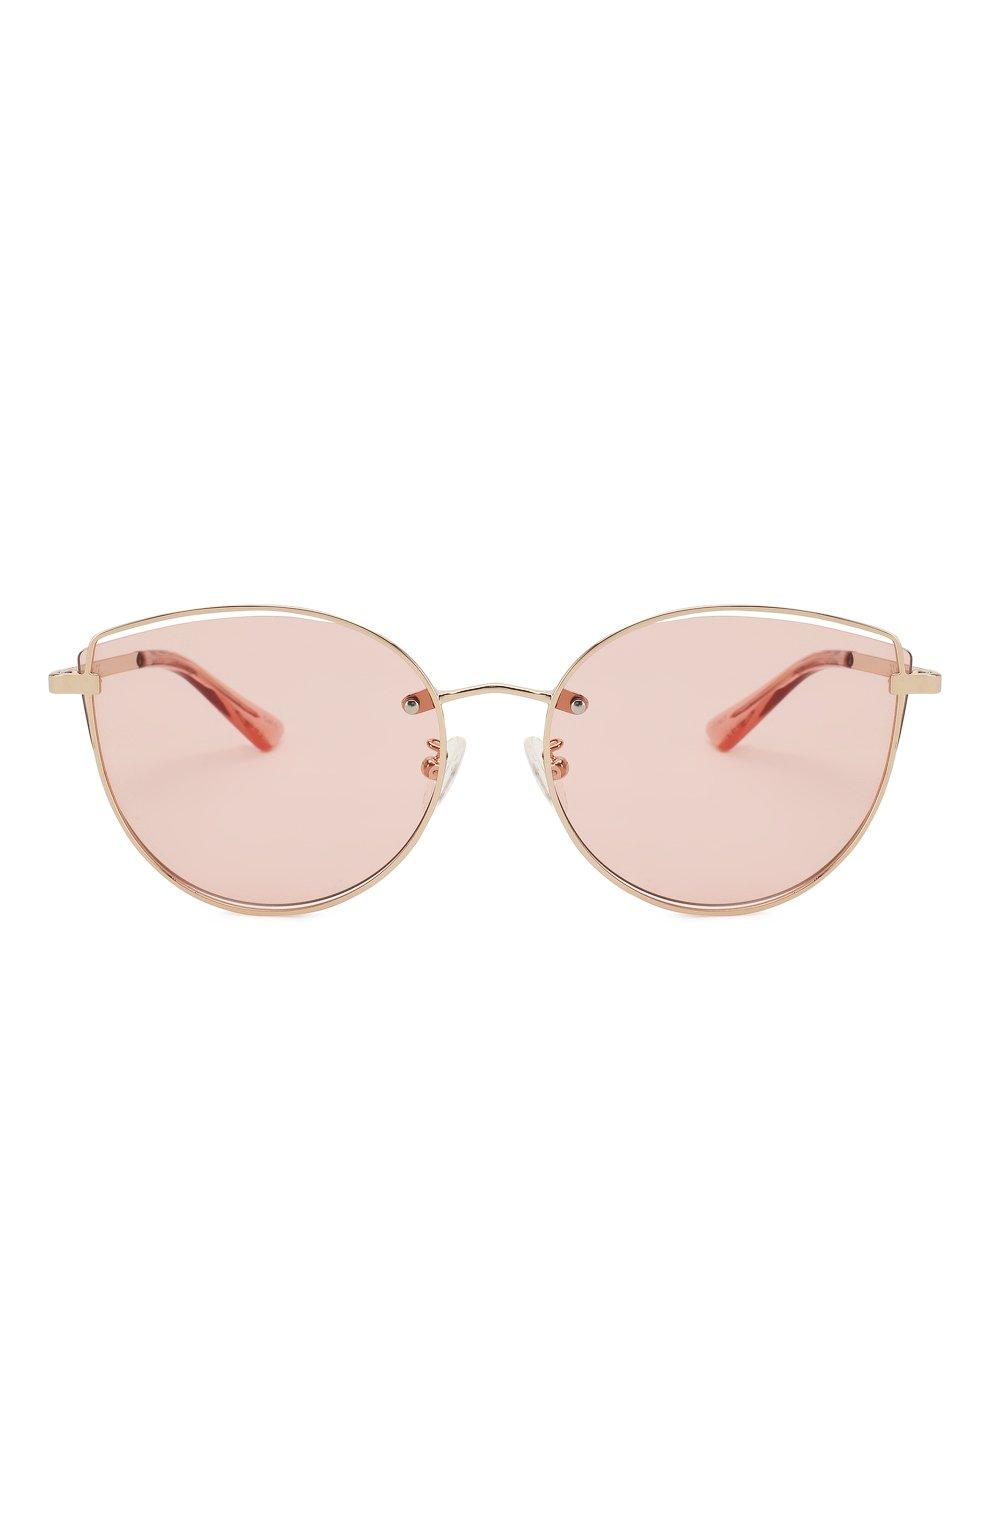 Женские солнцезащитные очки MCQ SWALLOW розового цвета, арт. MQ0248SK 004 | Фото 3